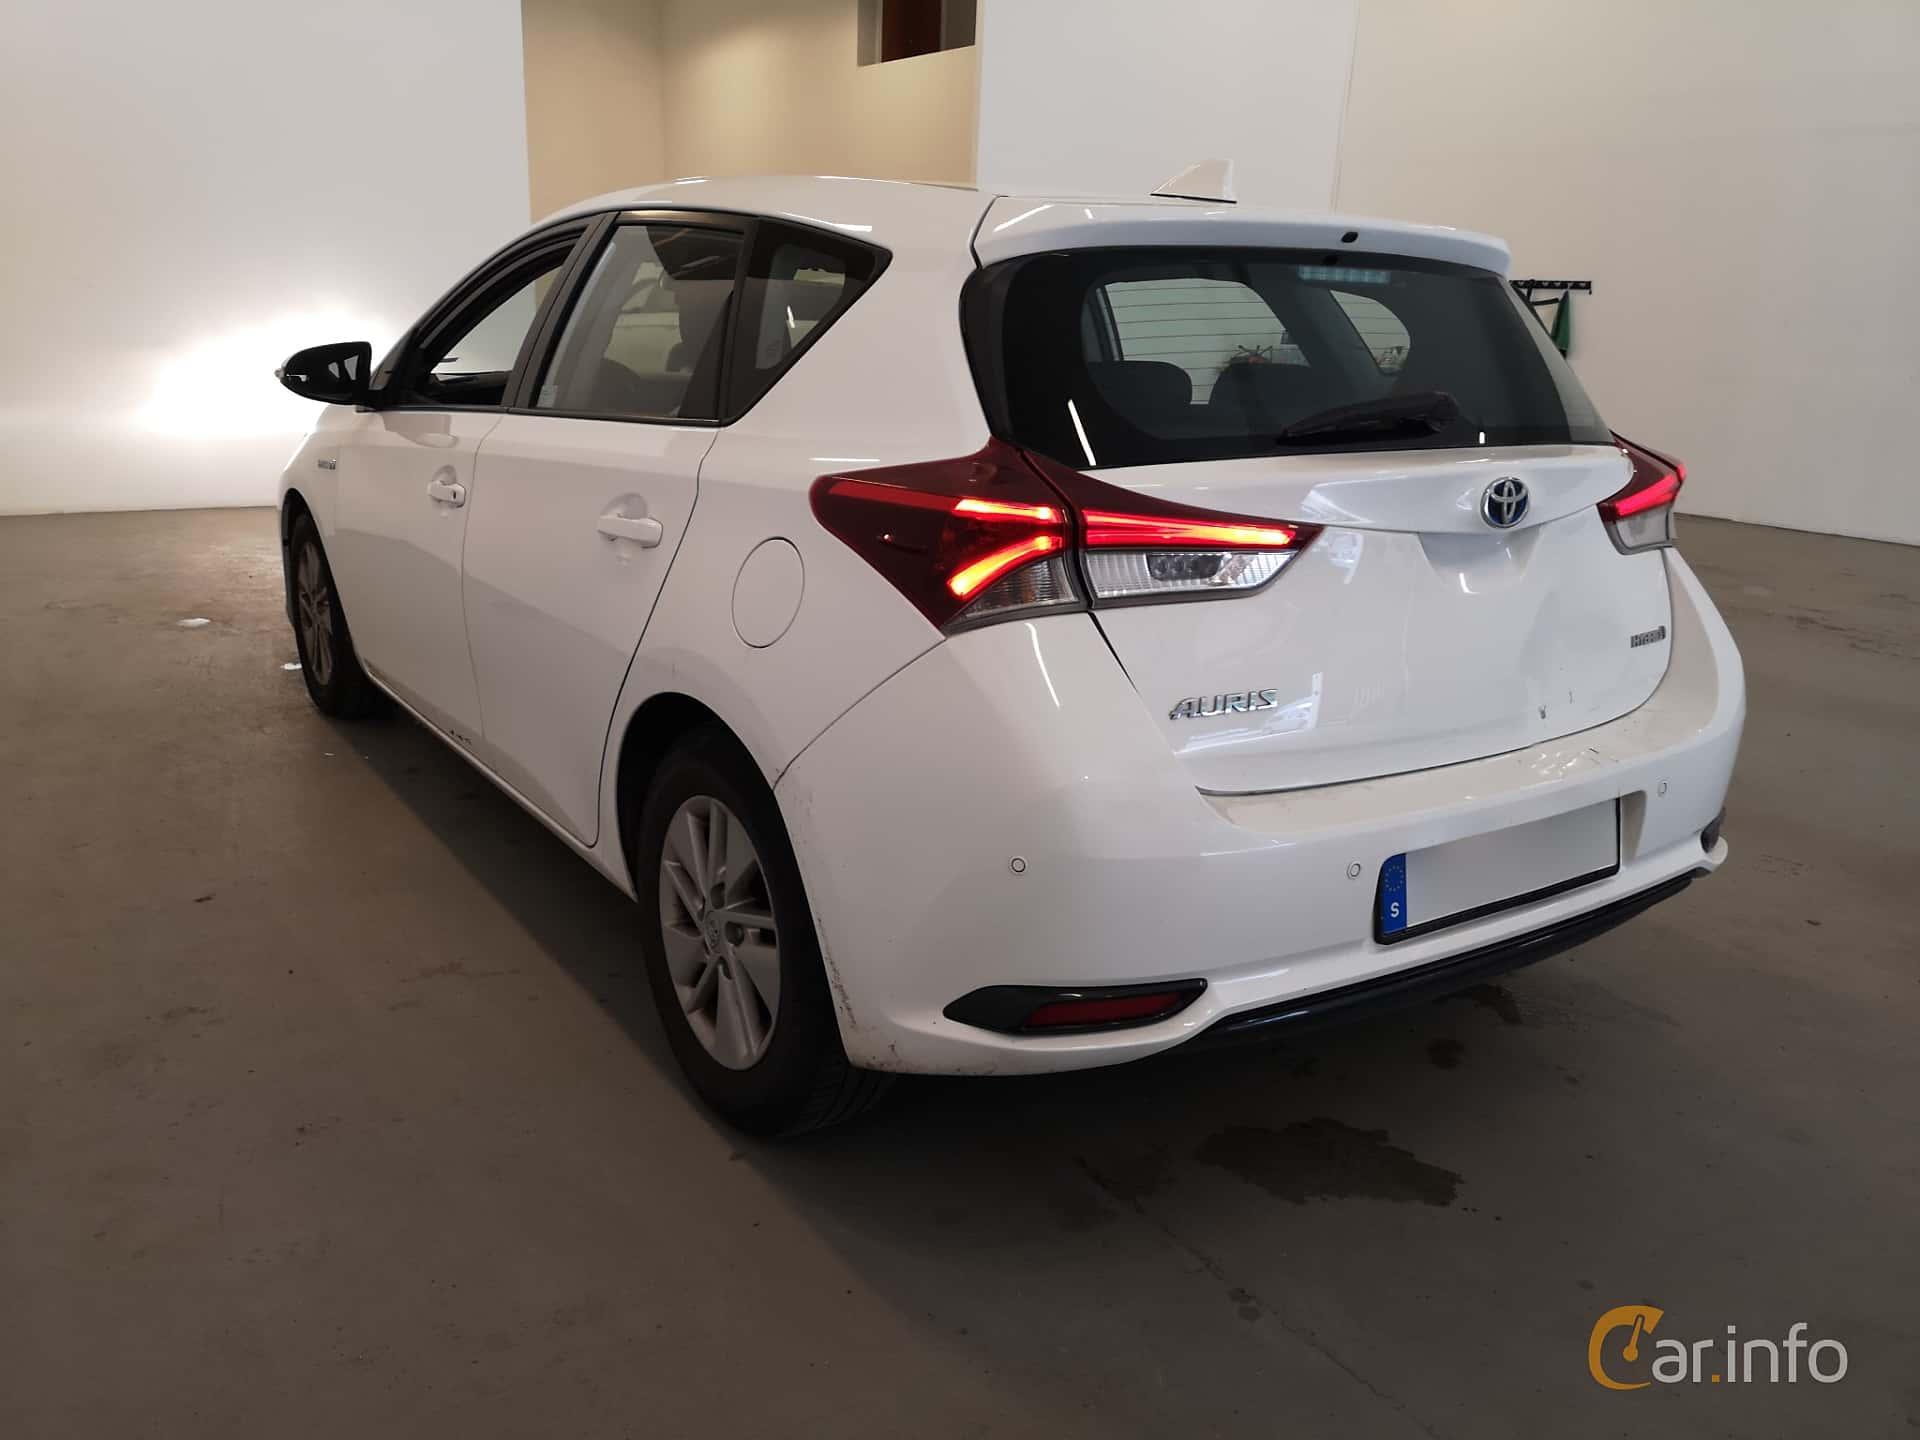 Toyota Auris Hybrid 1.8 VVT-i + 3JM CVT, 136hp, 2017